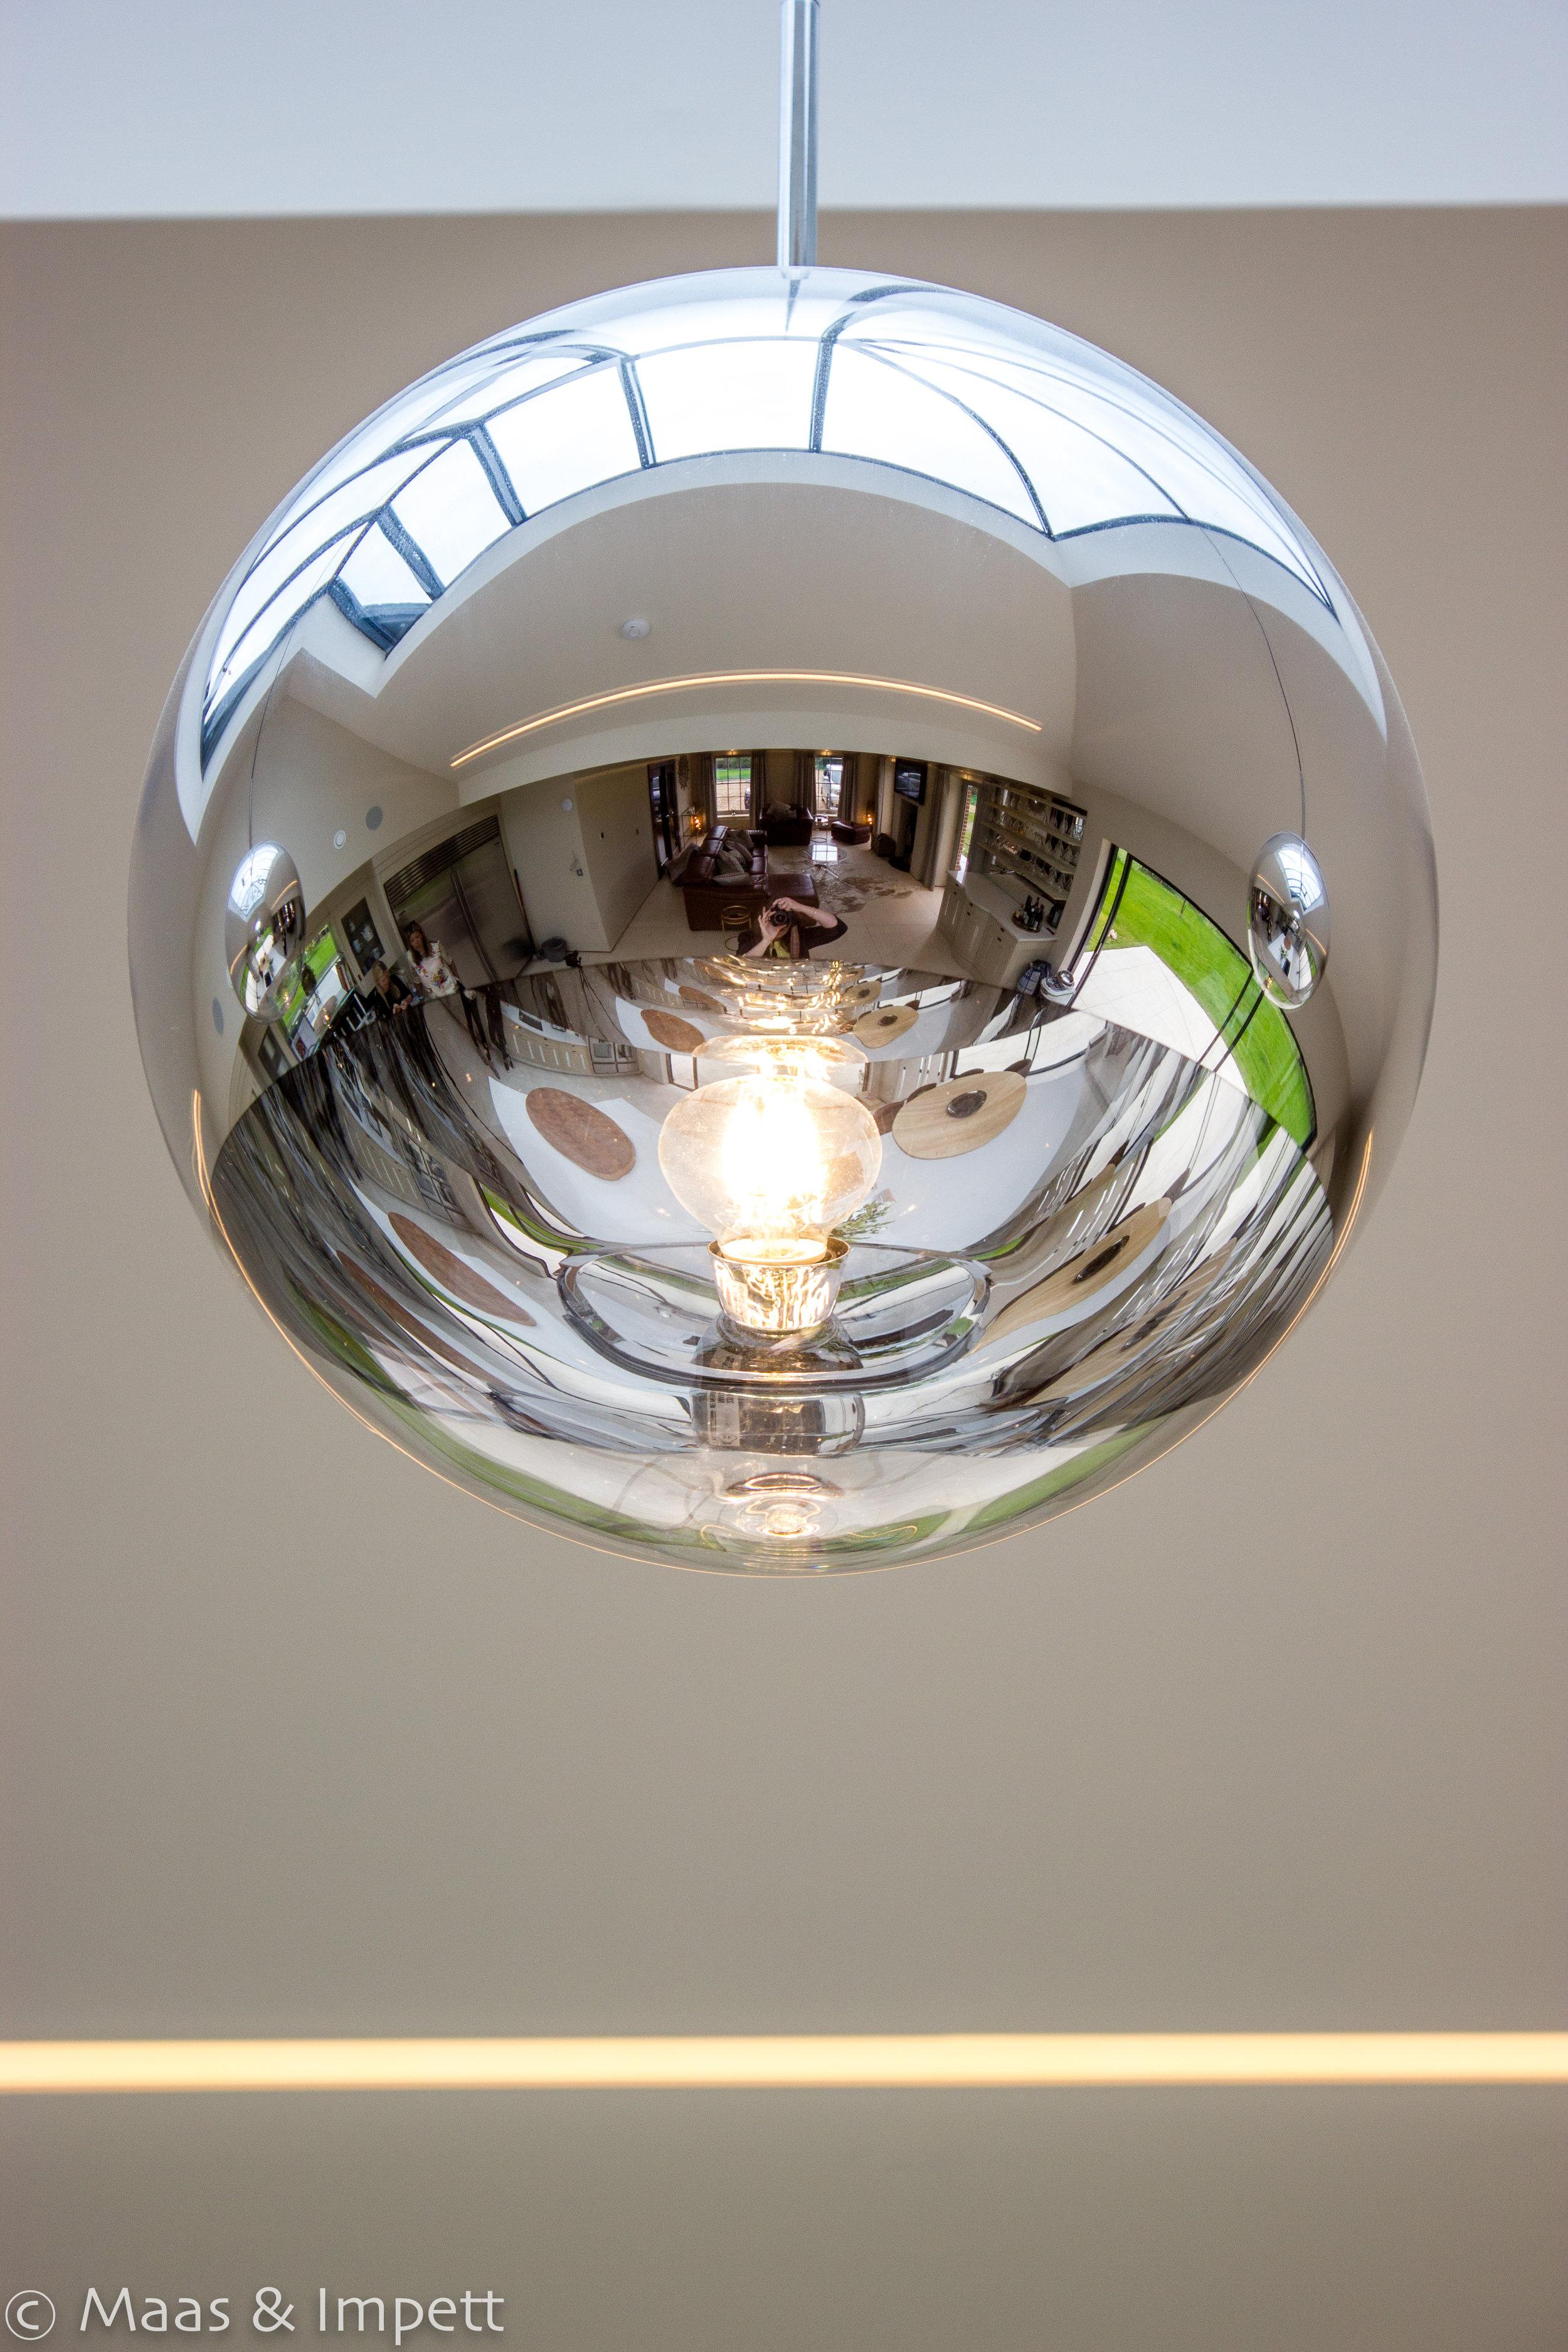 Lighting interior design, hampshire